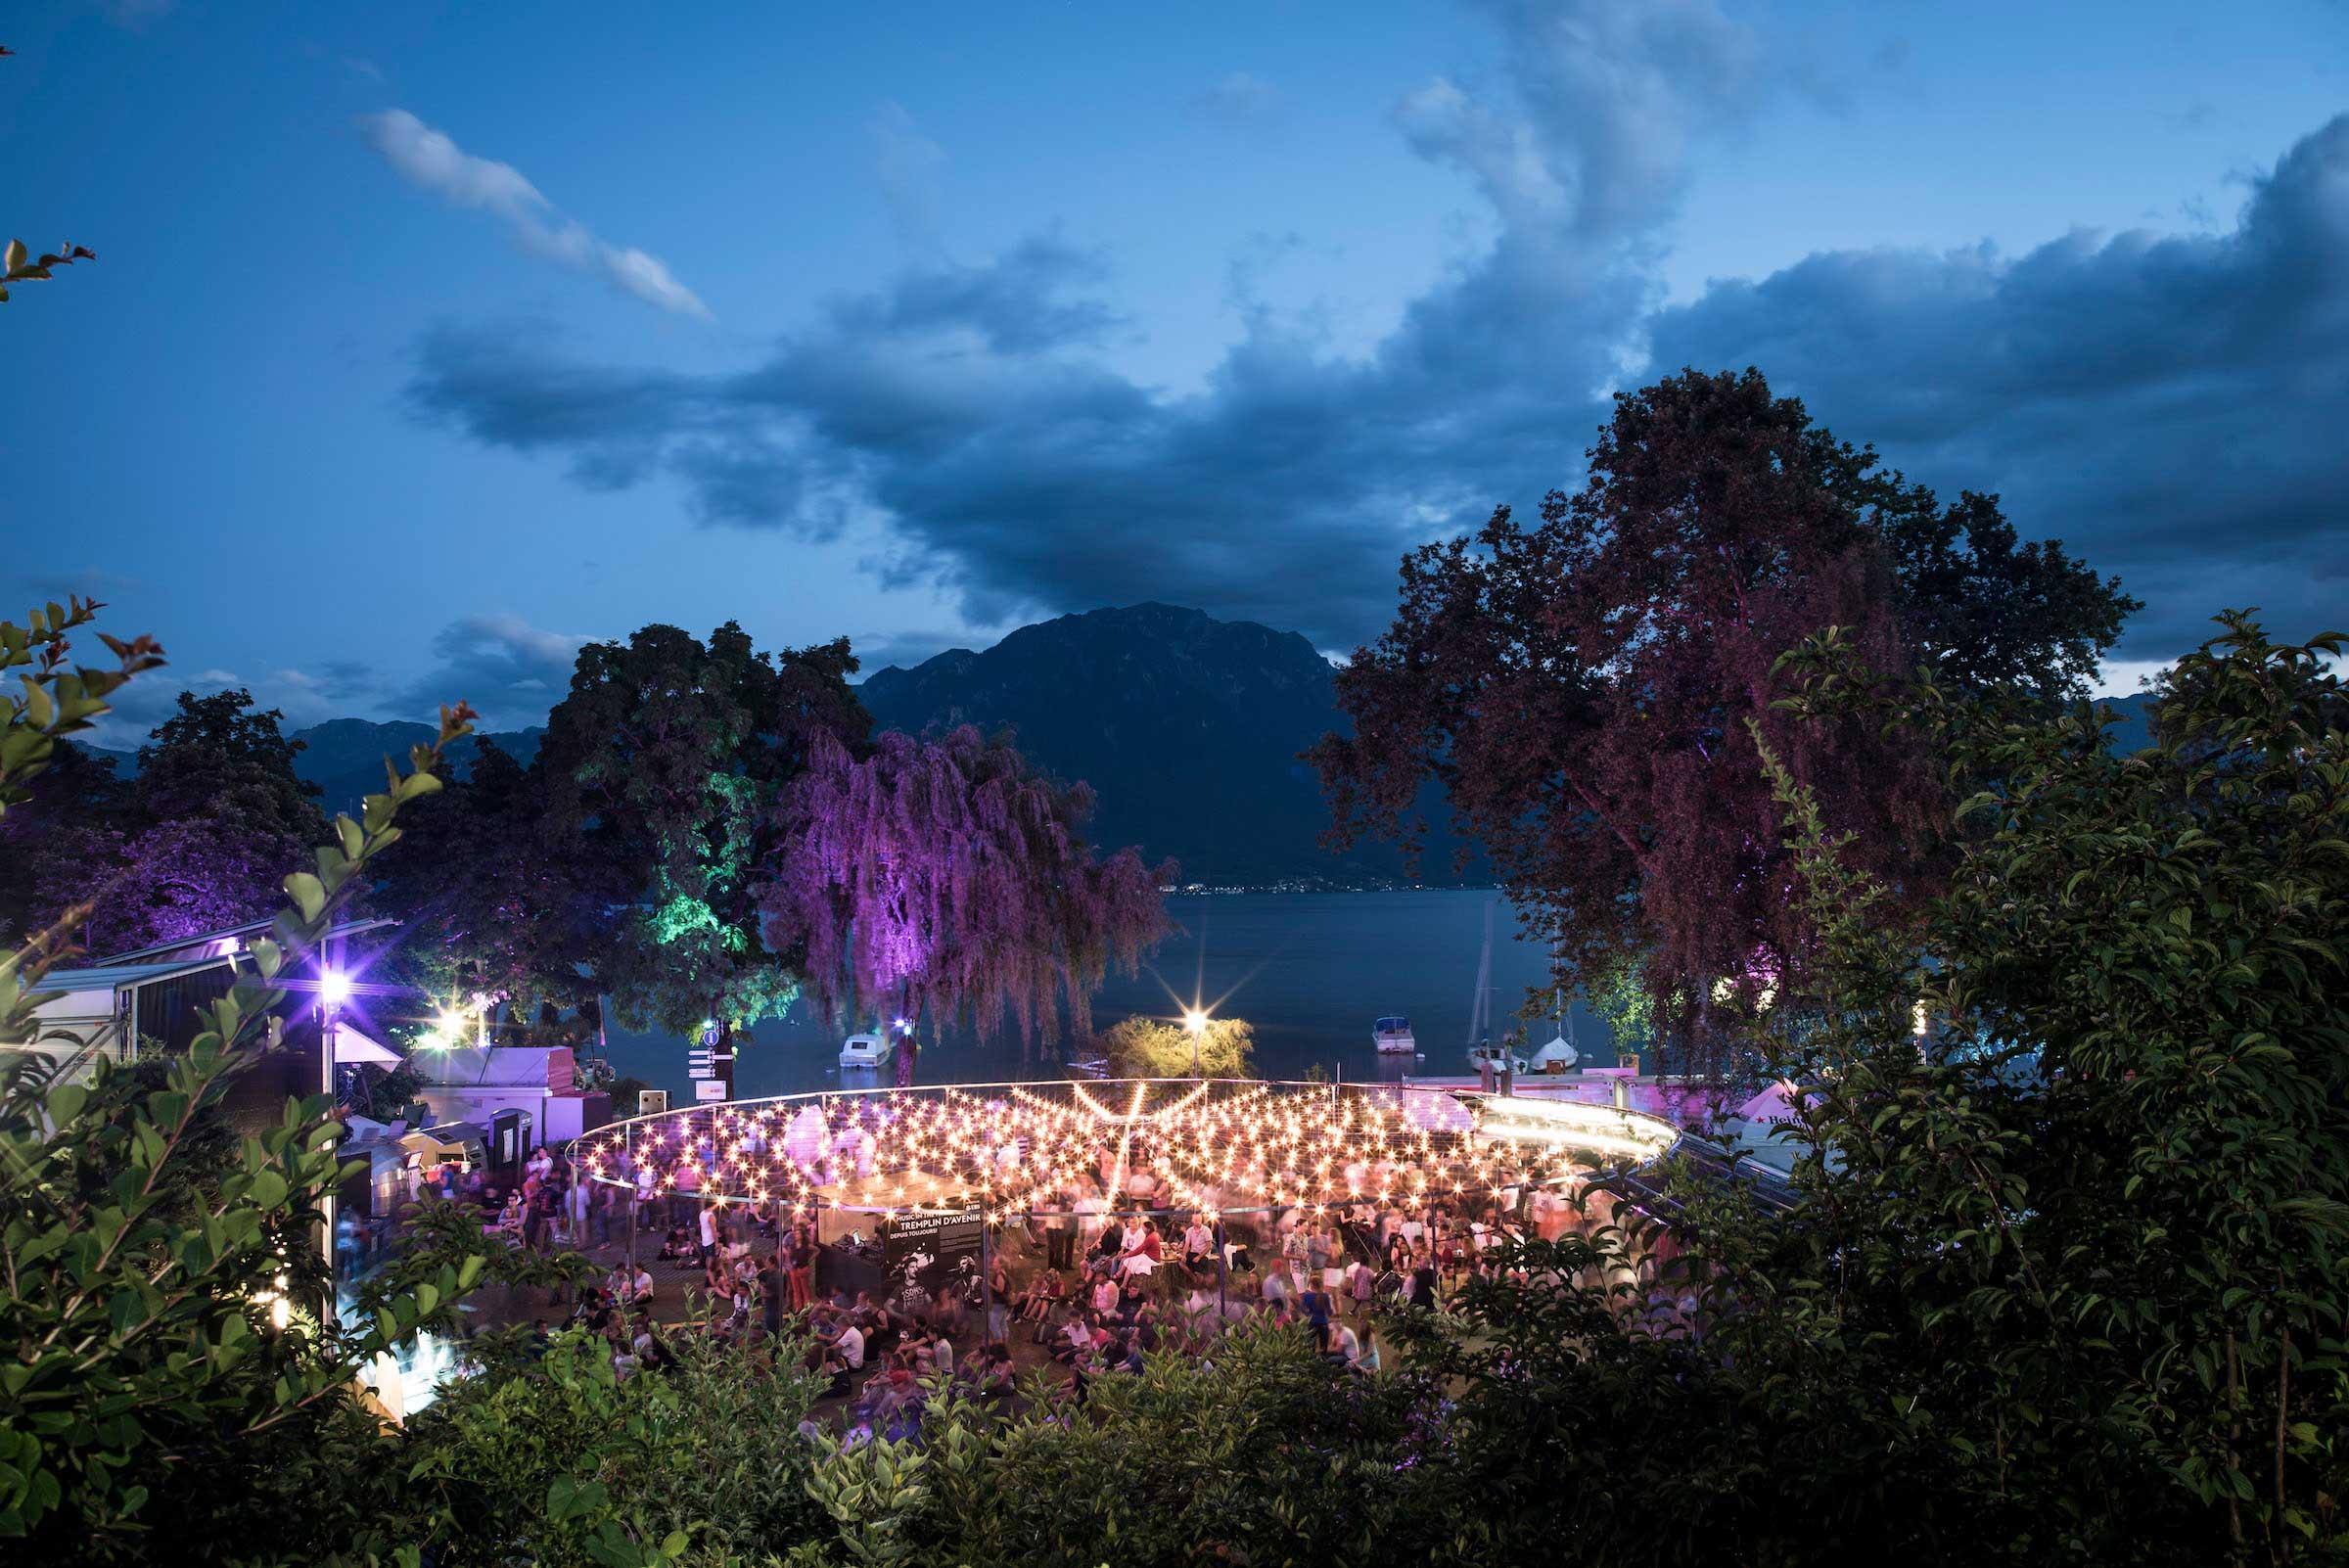 Montreux Jazz Festival >> Montreux Jazz Festival | Destinations Magazine